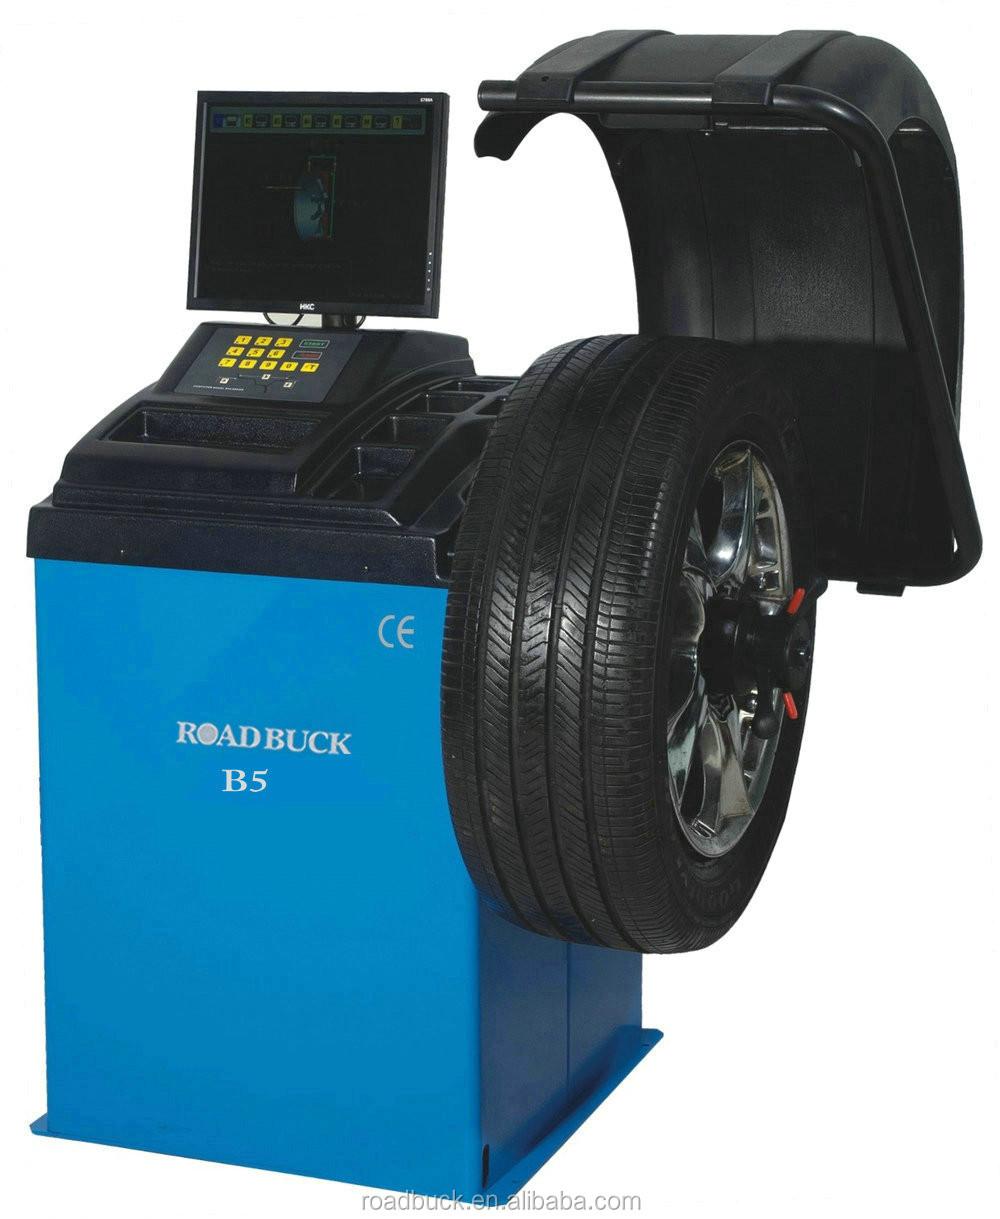 Long Life Low Repair Risks Hand Spin Ce Wheel Balancer - Buy Hand Spin  Wheel Balancer,Ce Wheel Balancer,Wheel Balancer Repair Product on  Alibaba.com